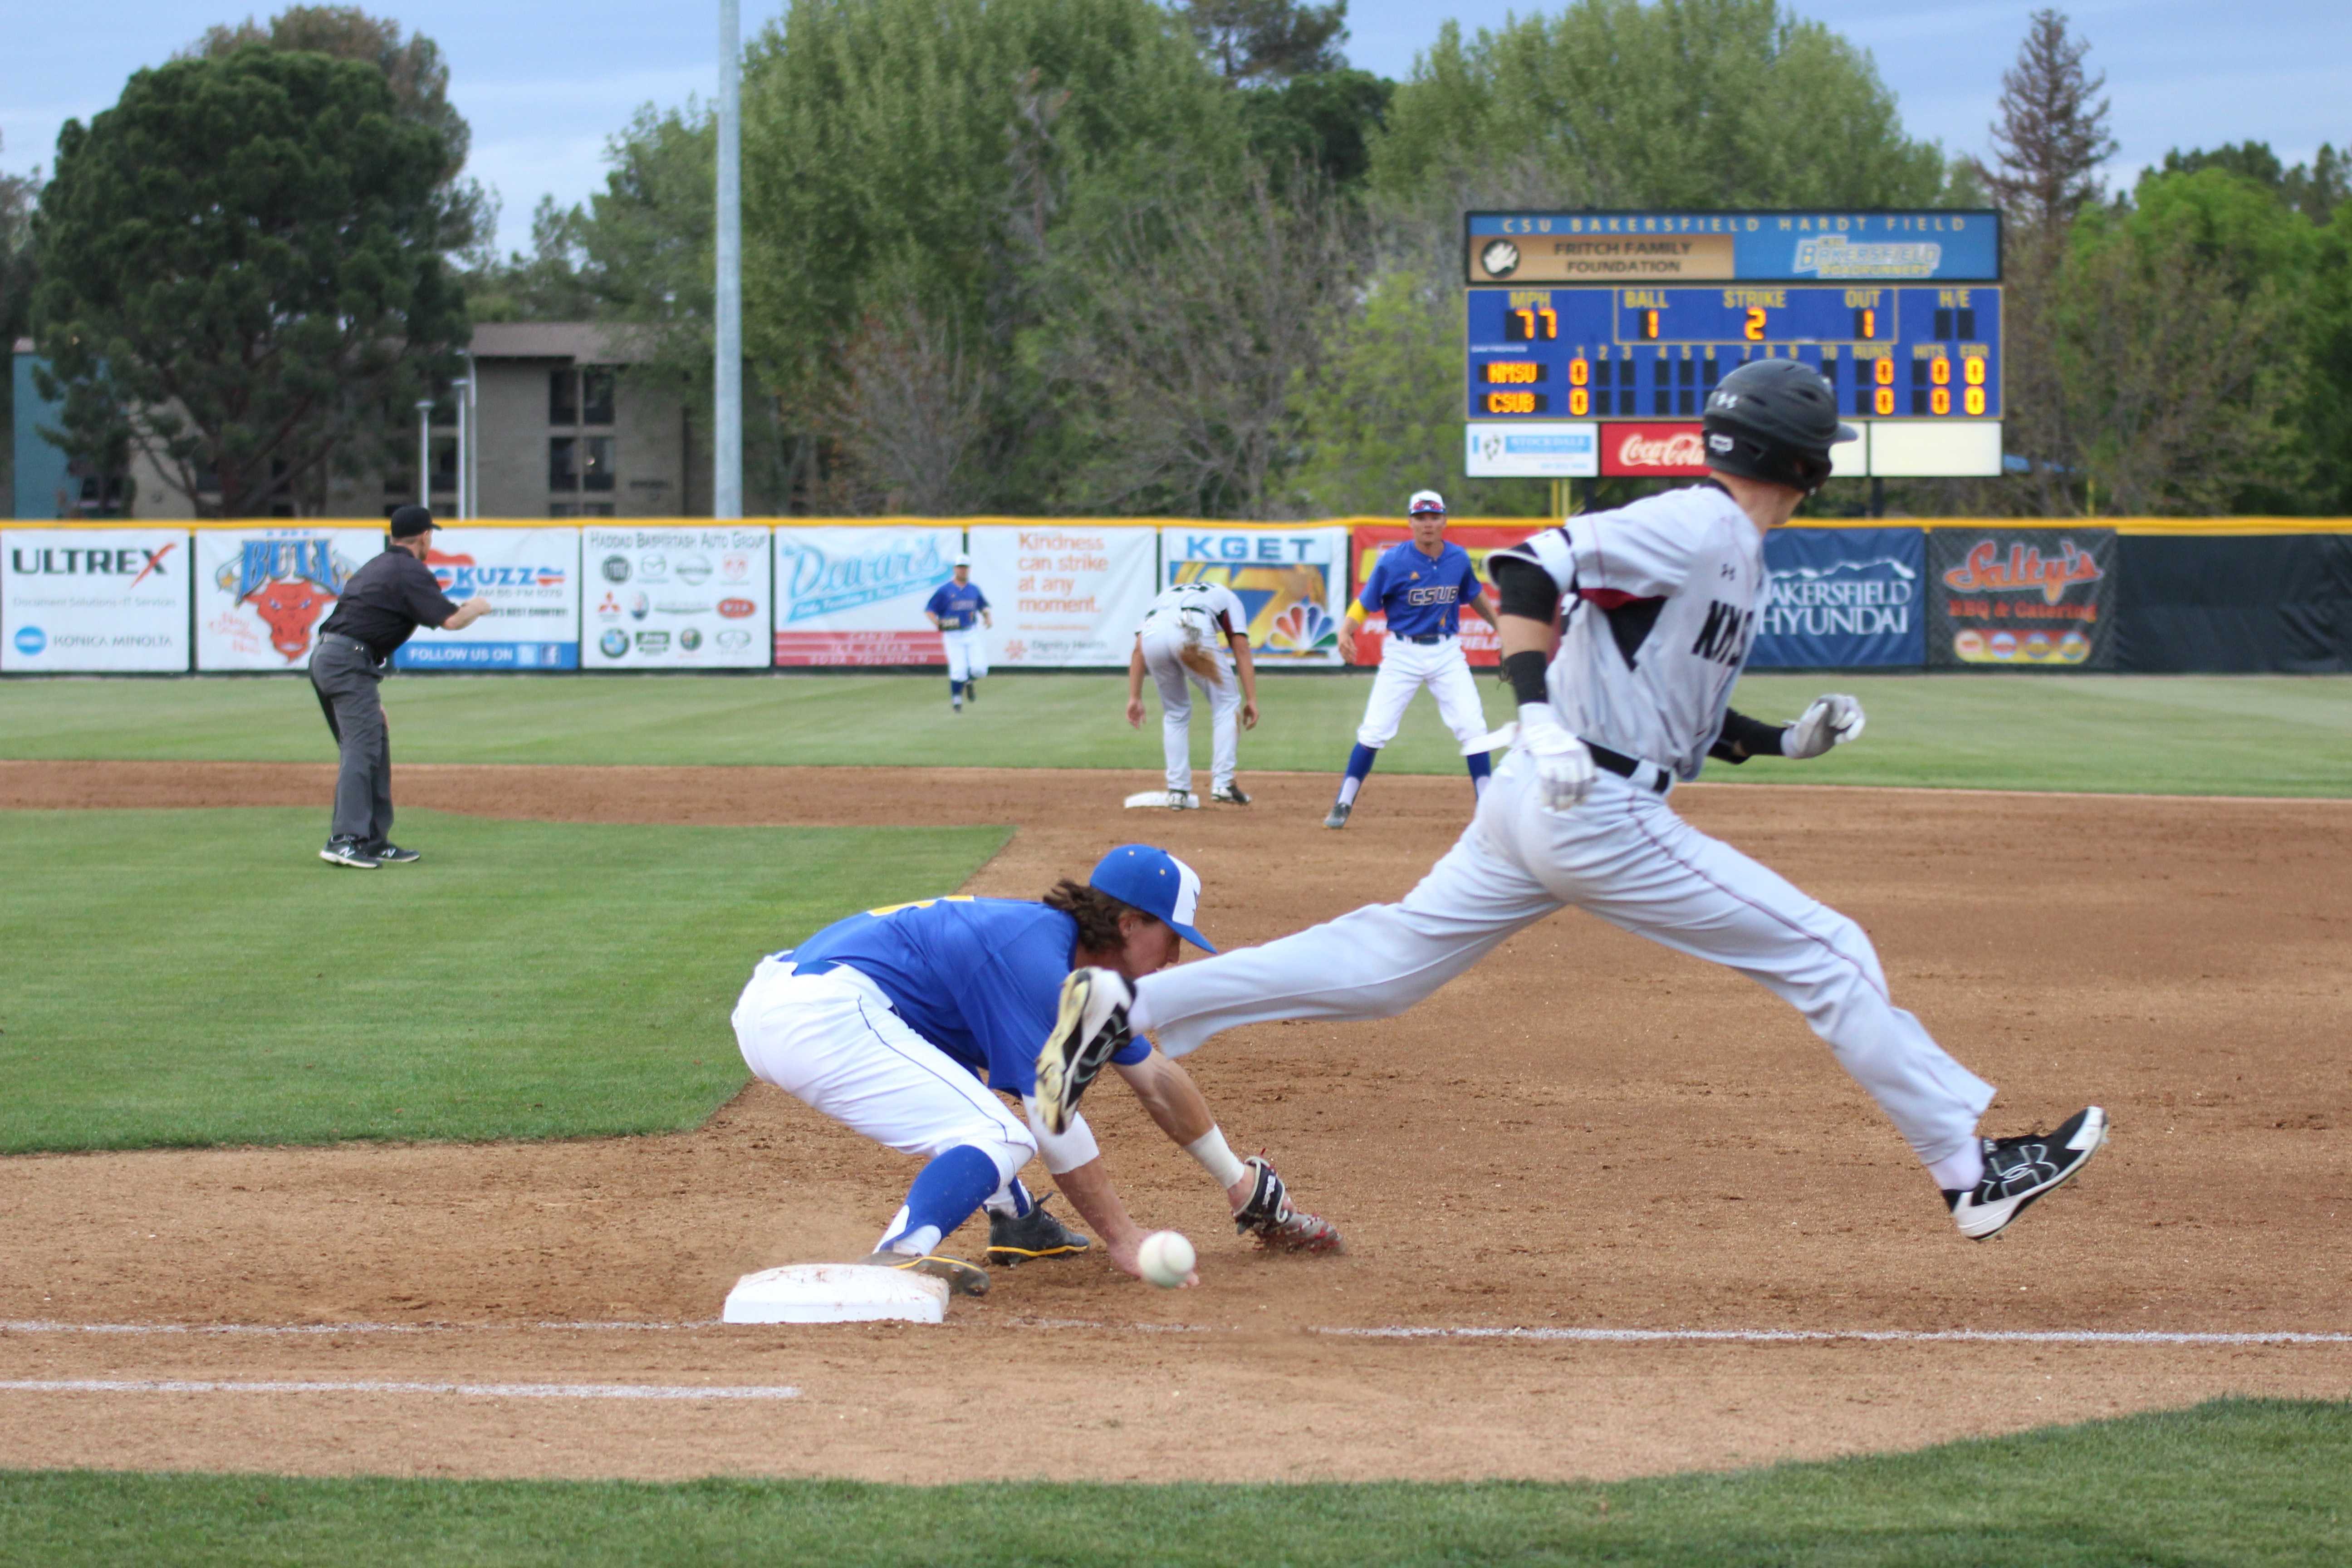 Errors define WAC baseball opener, CSUB loses 9-3